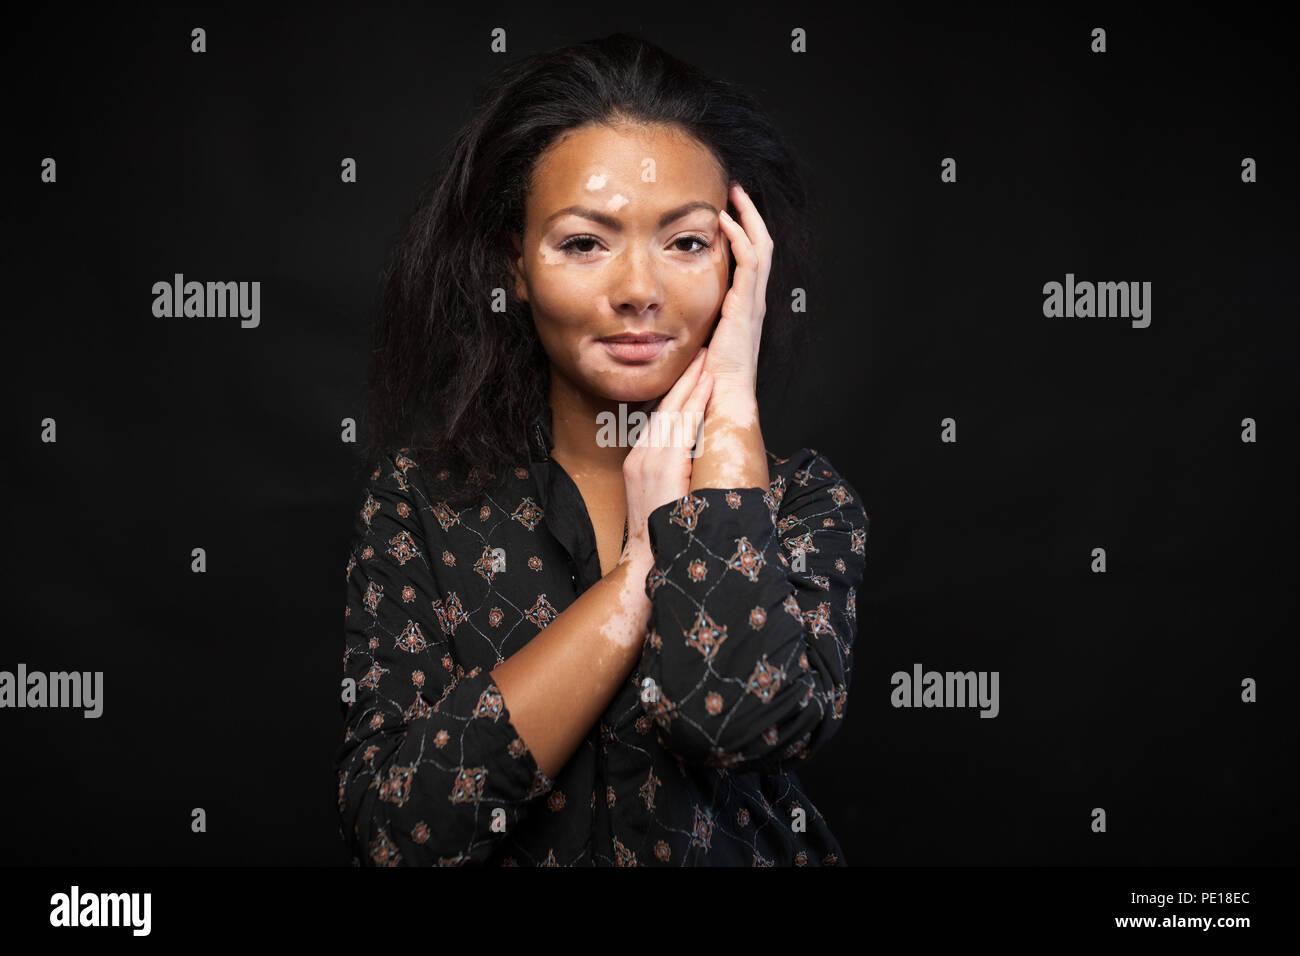 Beautiful African Girl With Skin Problems Vitiligo Concept Stock Photo Alamy